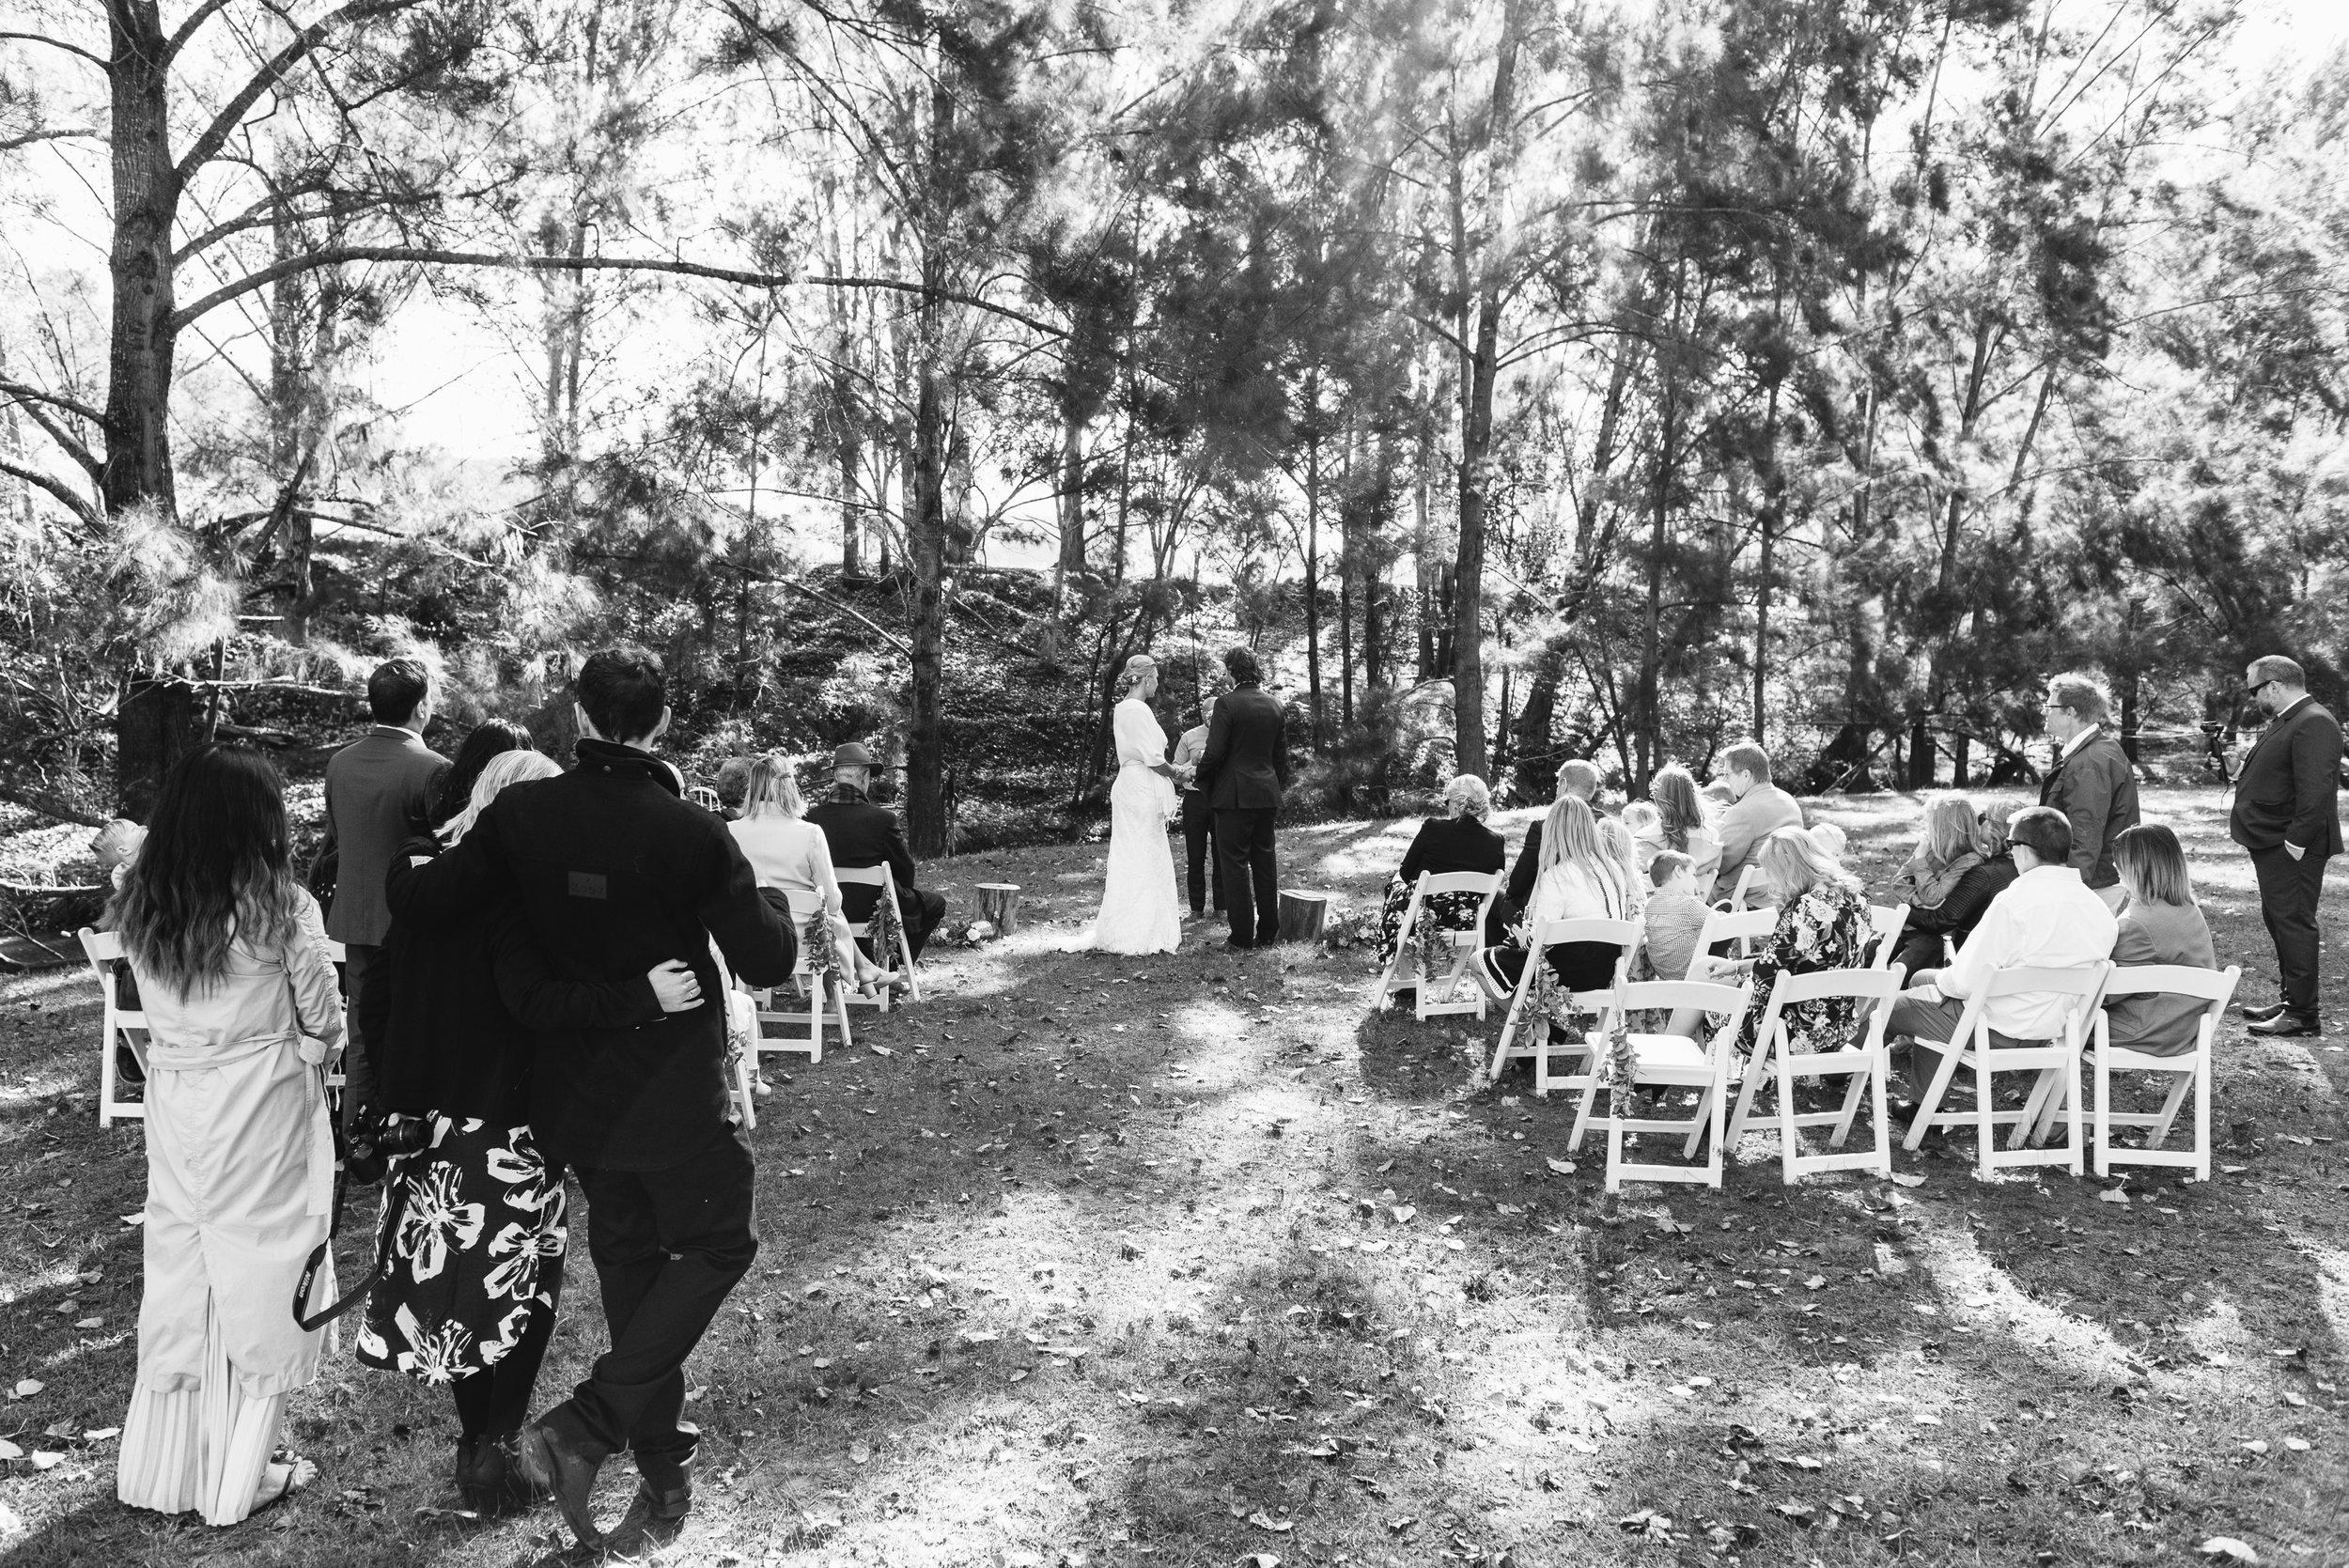 weddings by atelier photography-wedding-06.jpg